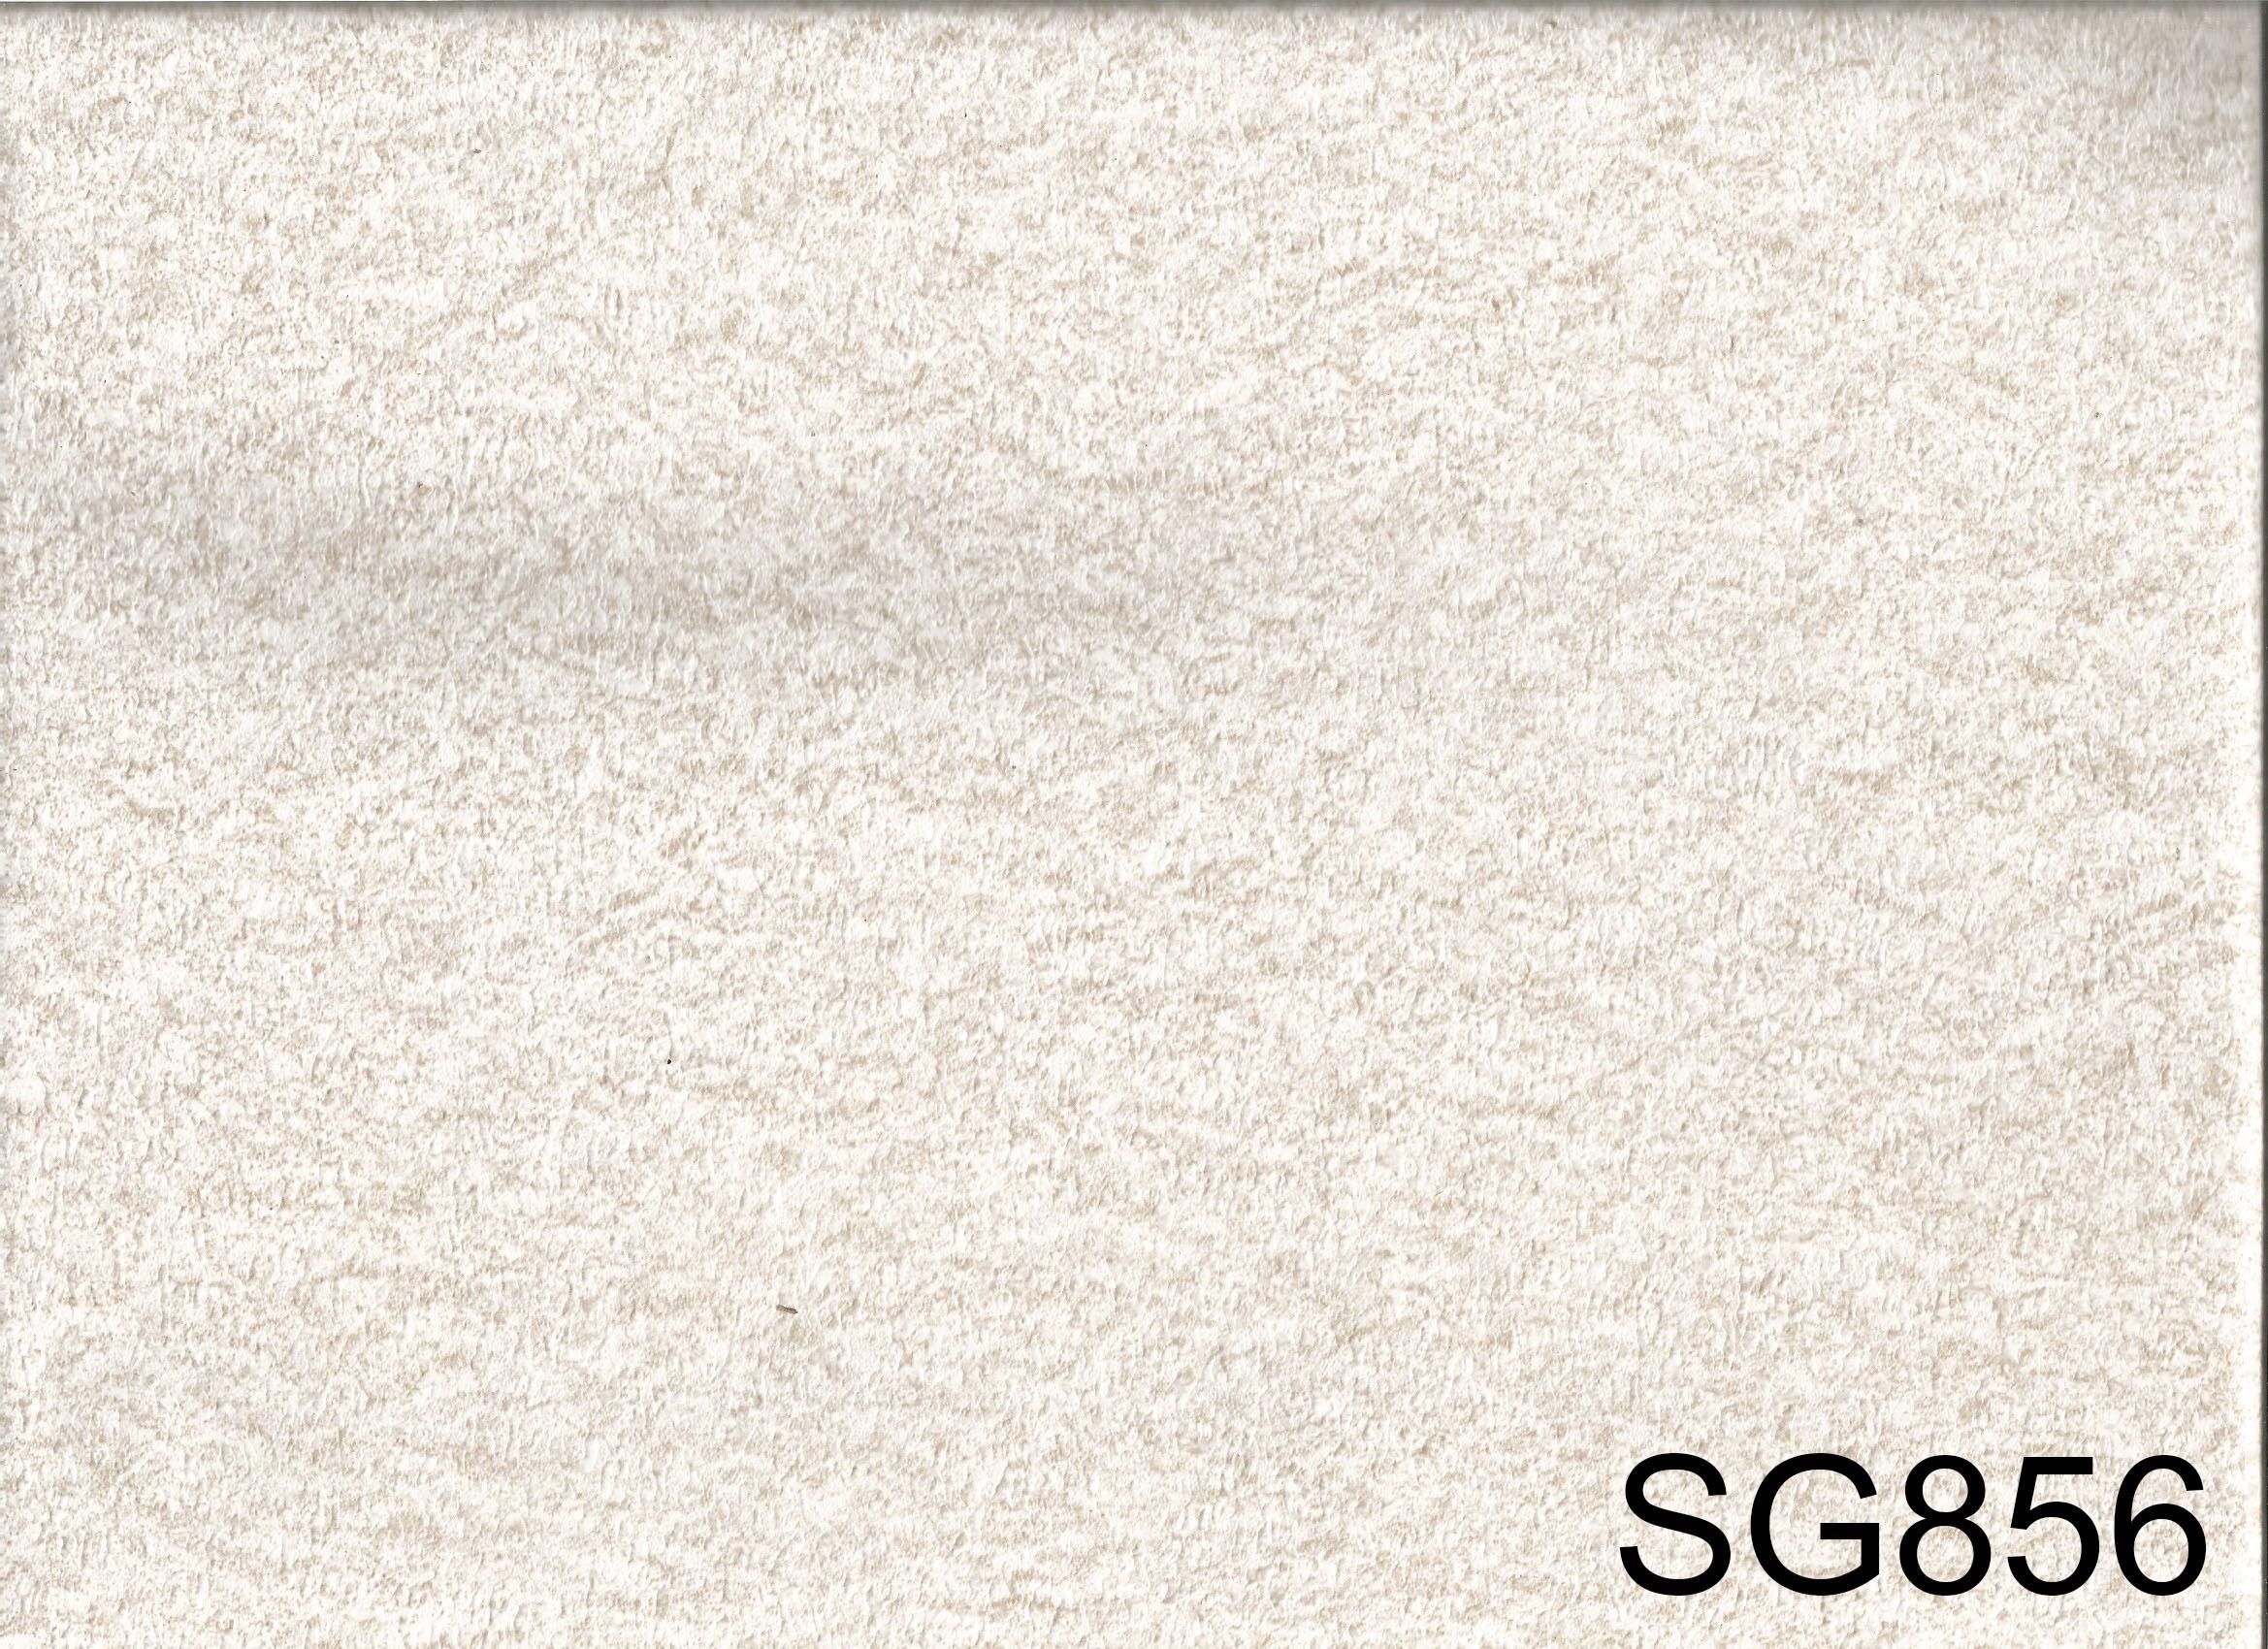 SG856